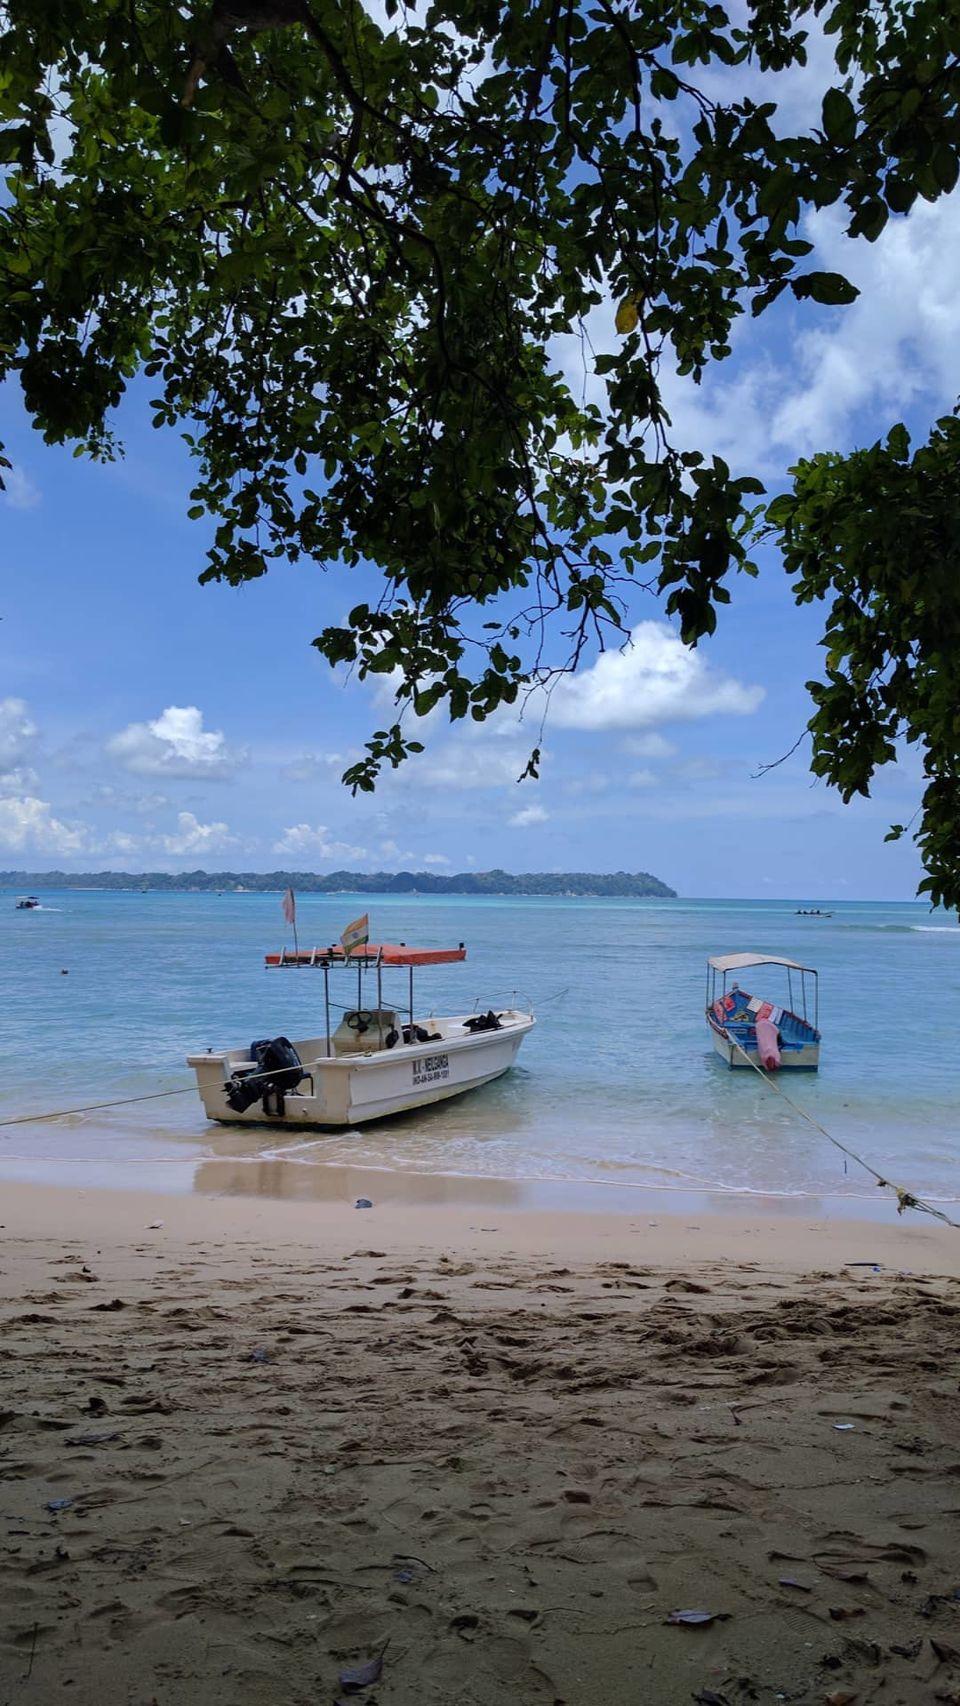 Photo of Bharatpur Beach, Neil Island, Bharatpur, Andaman and Nicobar Islands, India by Swati Singh